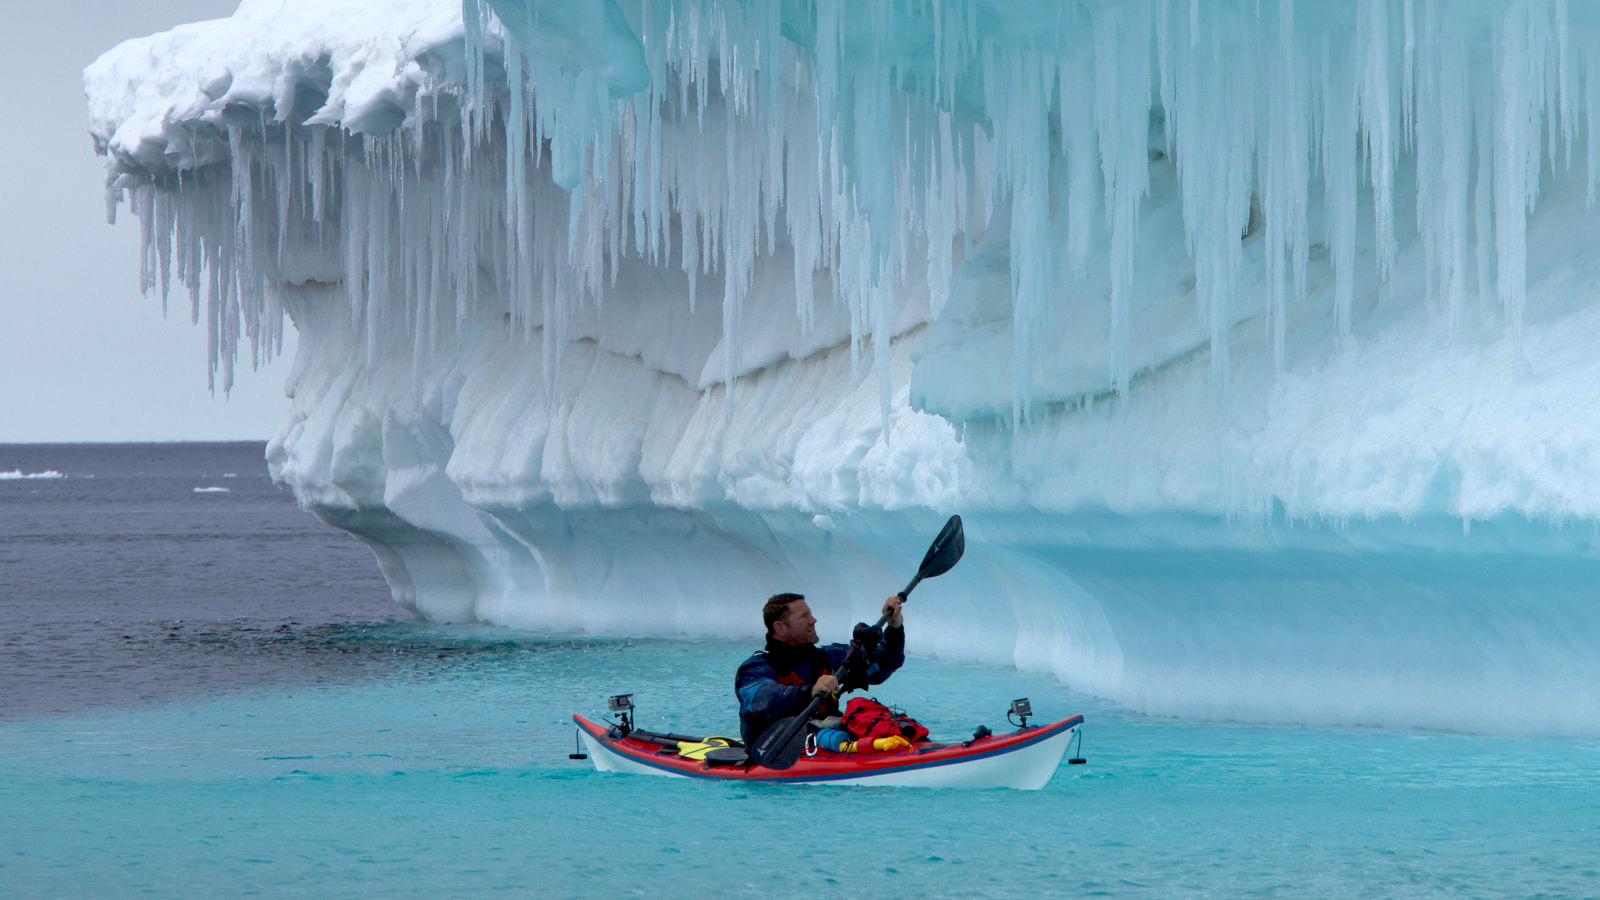 Expedition Unpacked: Nέα σειρά ντοκιμαντέρ στην ΕΡΤ2